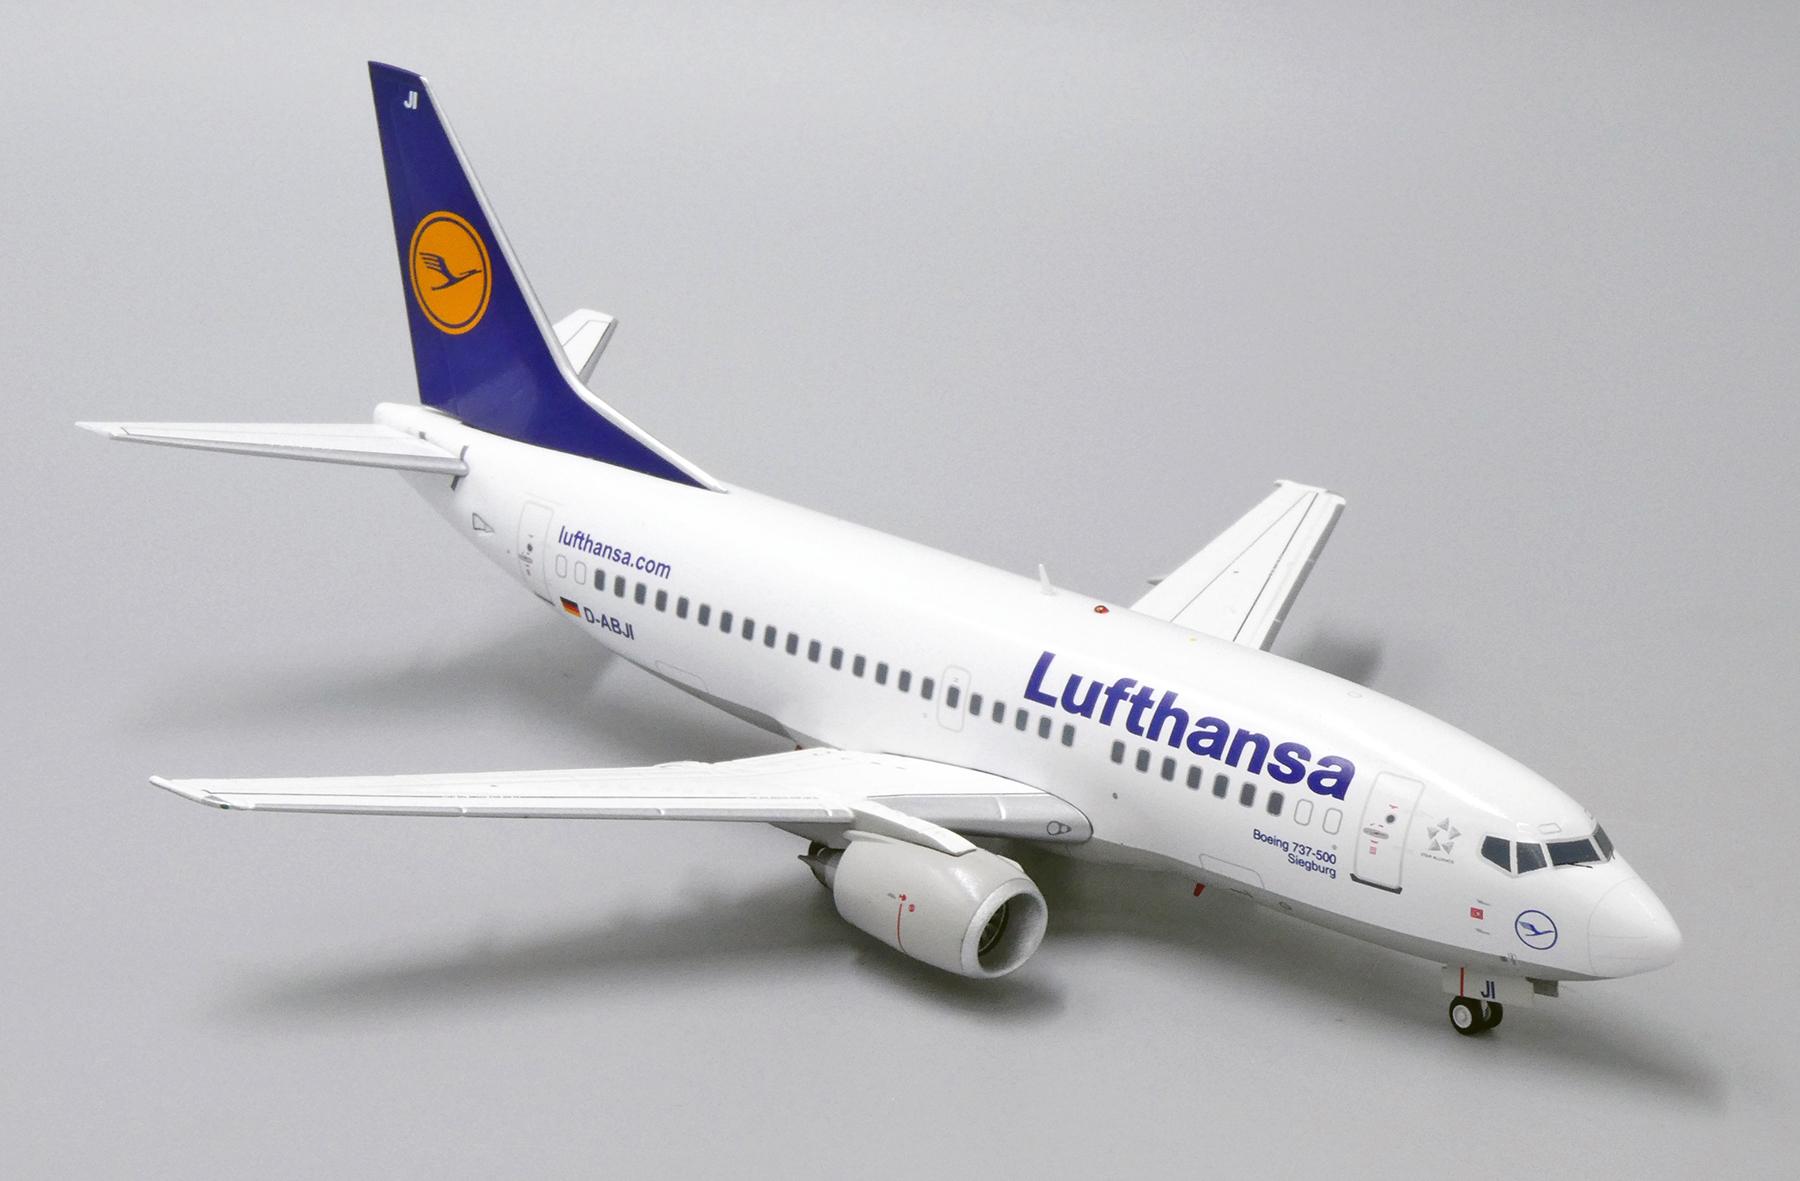 Scalemodelstore Com Jc Wings 1 200 Xx2379 Lufthansa Boeing 737 500